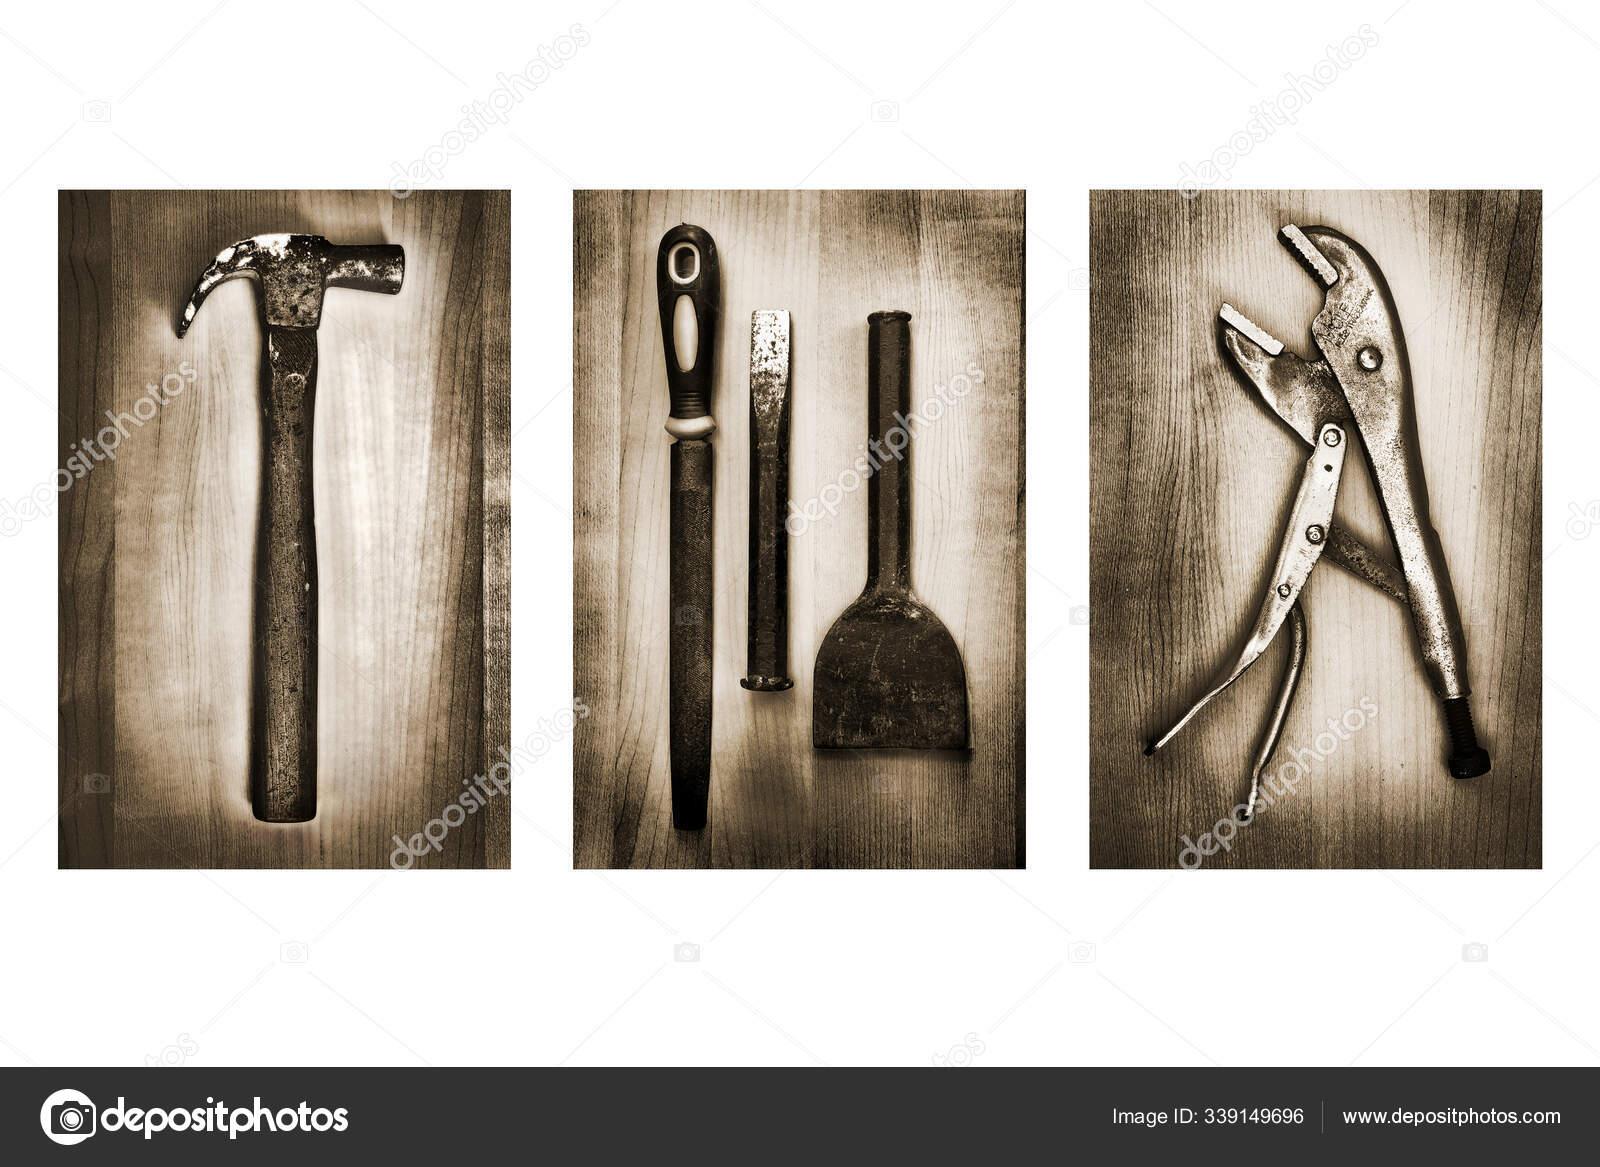 Set Dari Alat Alat Lama Dan Pisau Latar Belakang Putih Stok Foto C Panthermediaseller 339149696